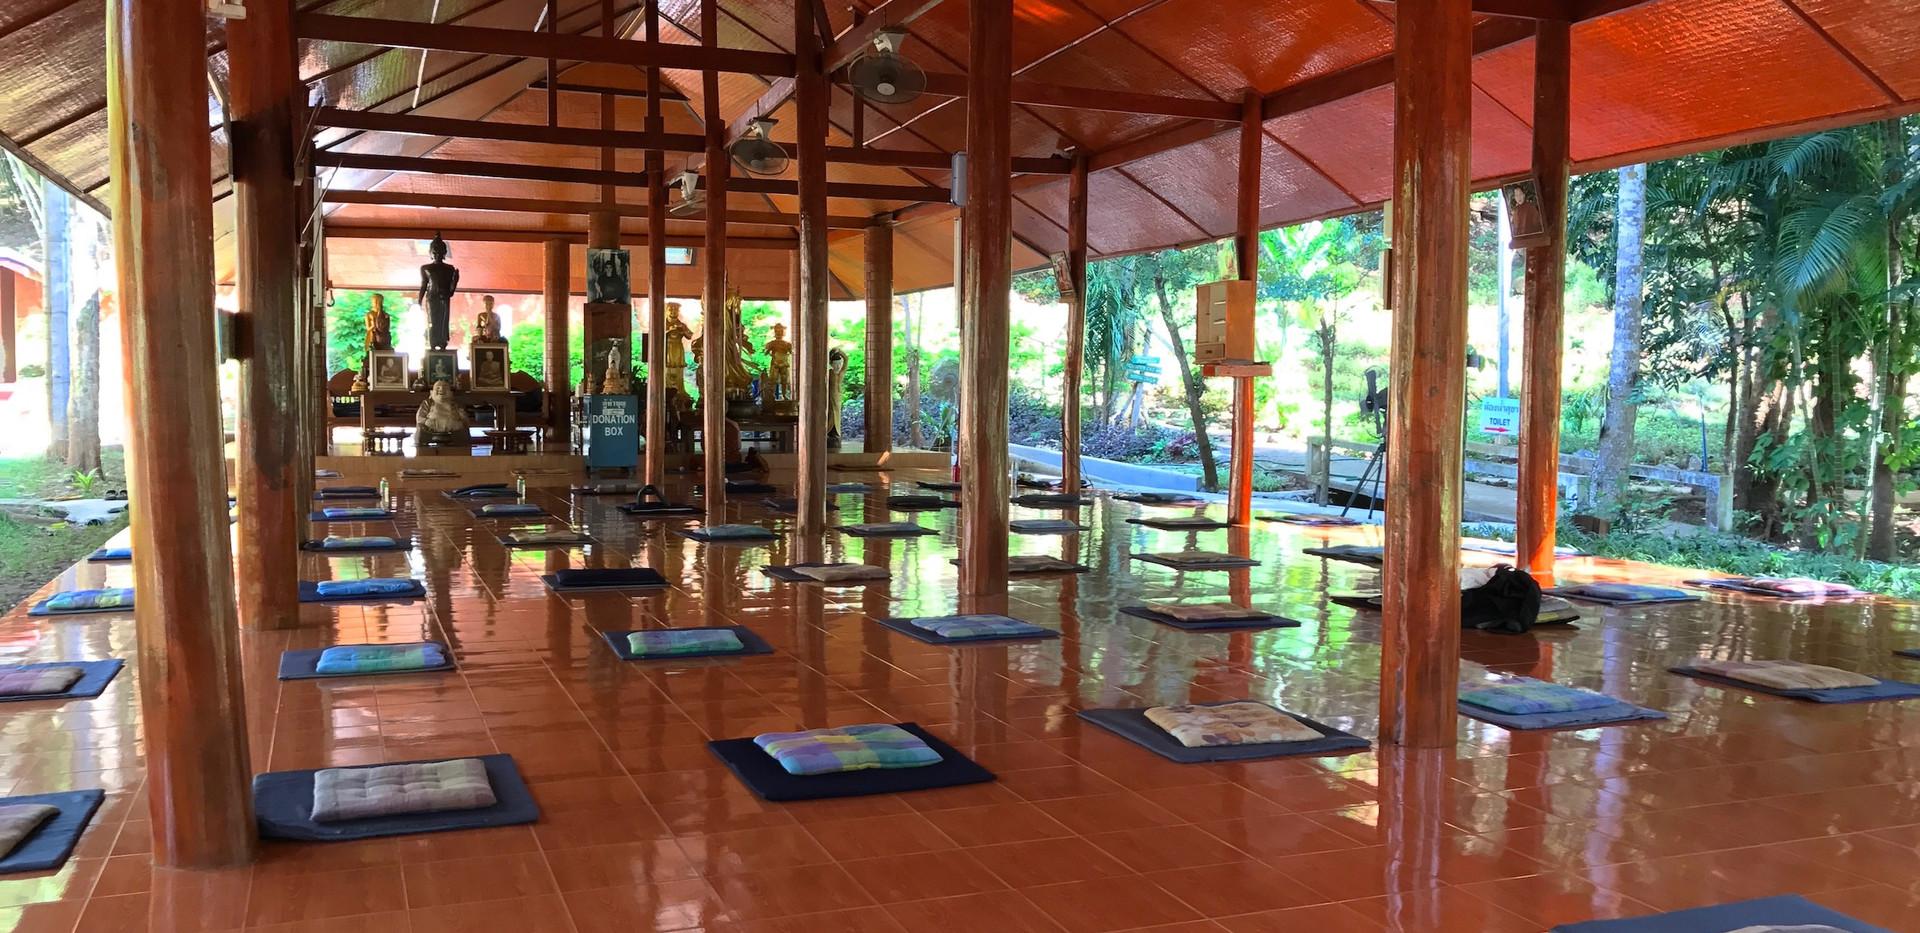 Thailand Yoga Holidays Destination Forest Meditation Center Yoga Sala